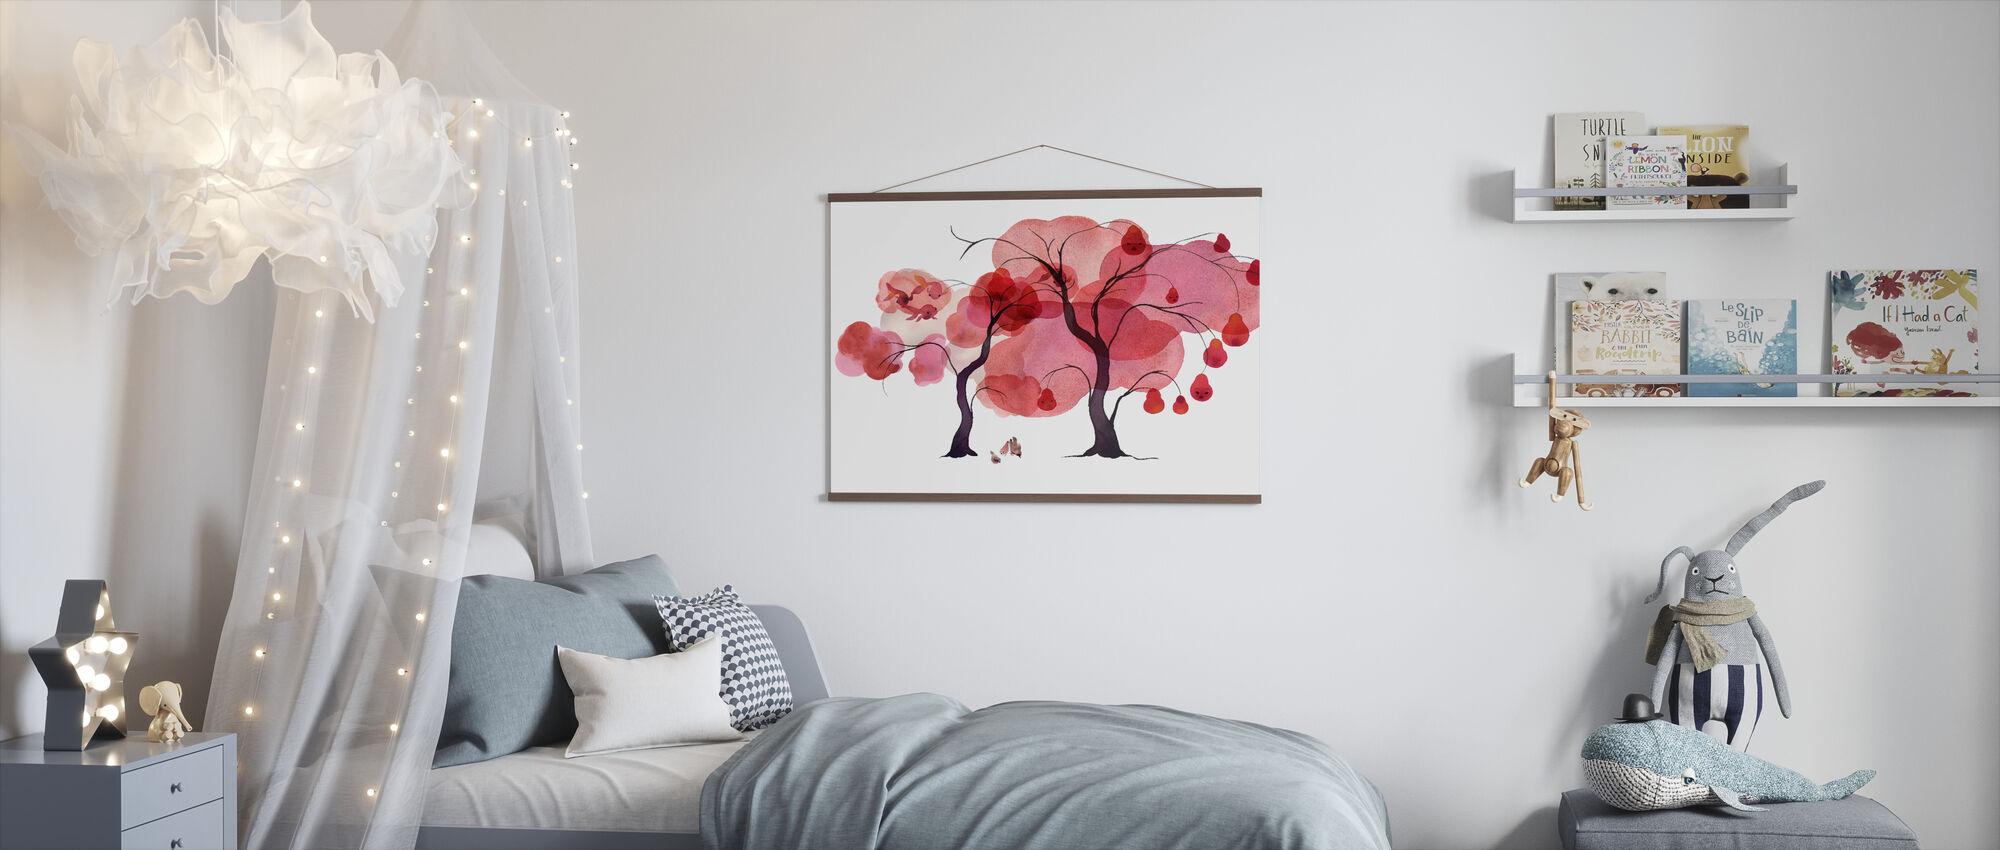 Water Color Trees III - Poster - Kids Room